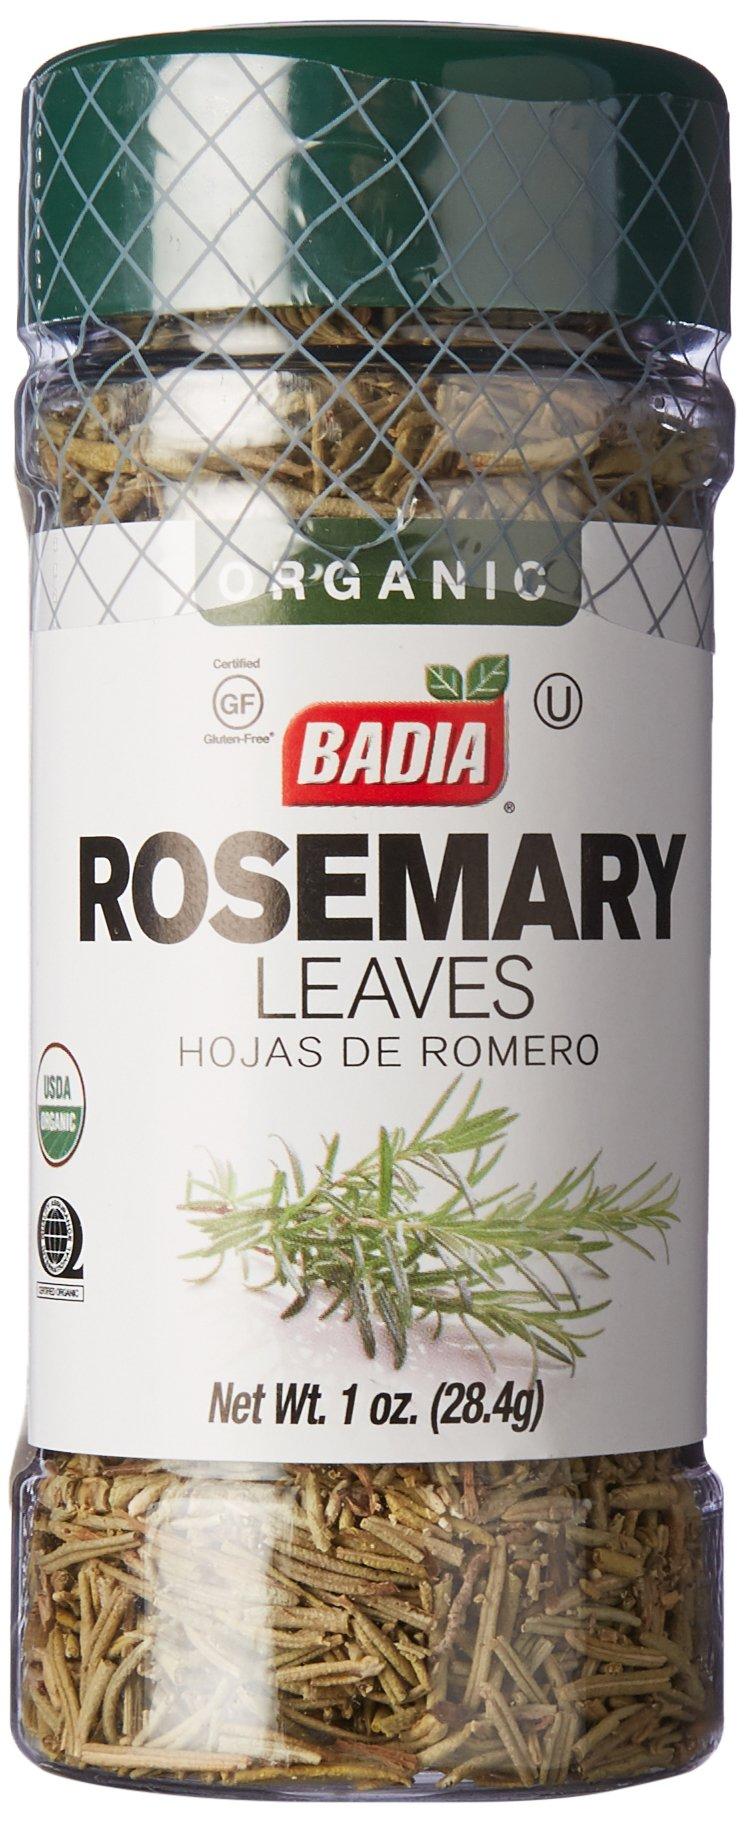 Badia Rosemary Leaves Organic 1 oz -Pack of 3